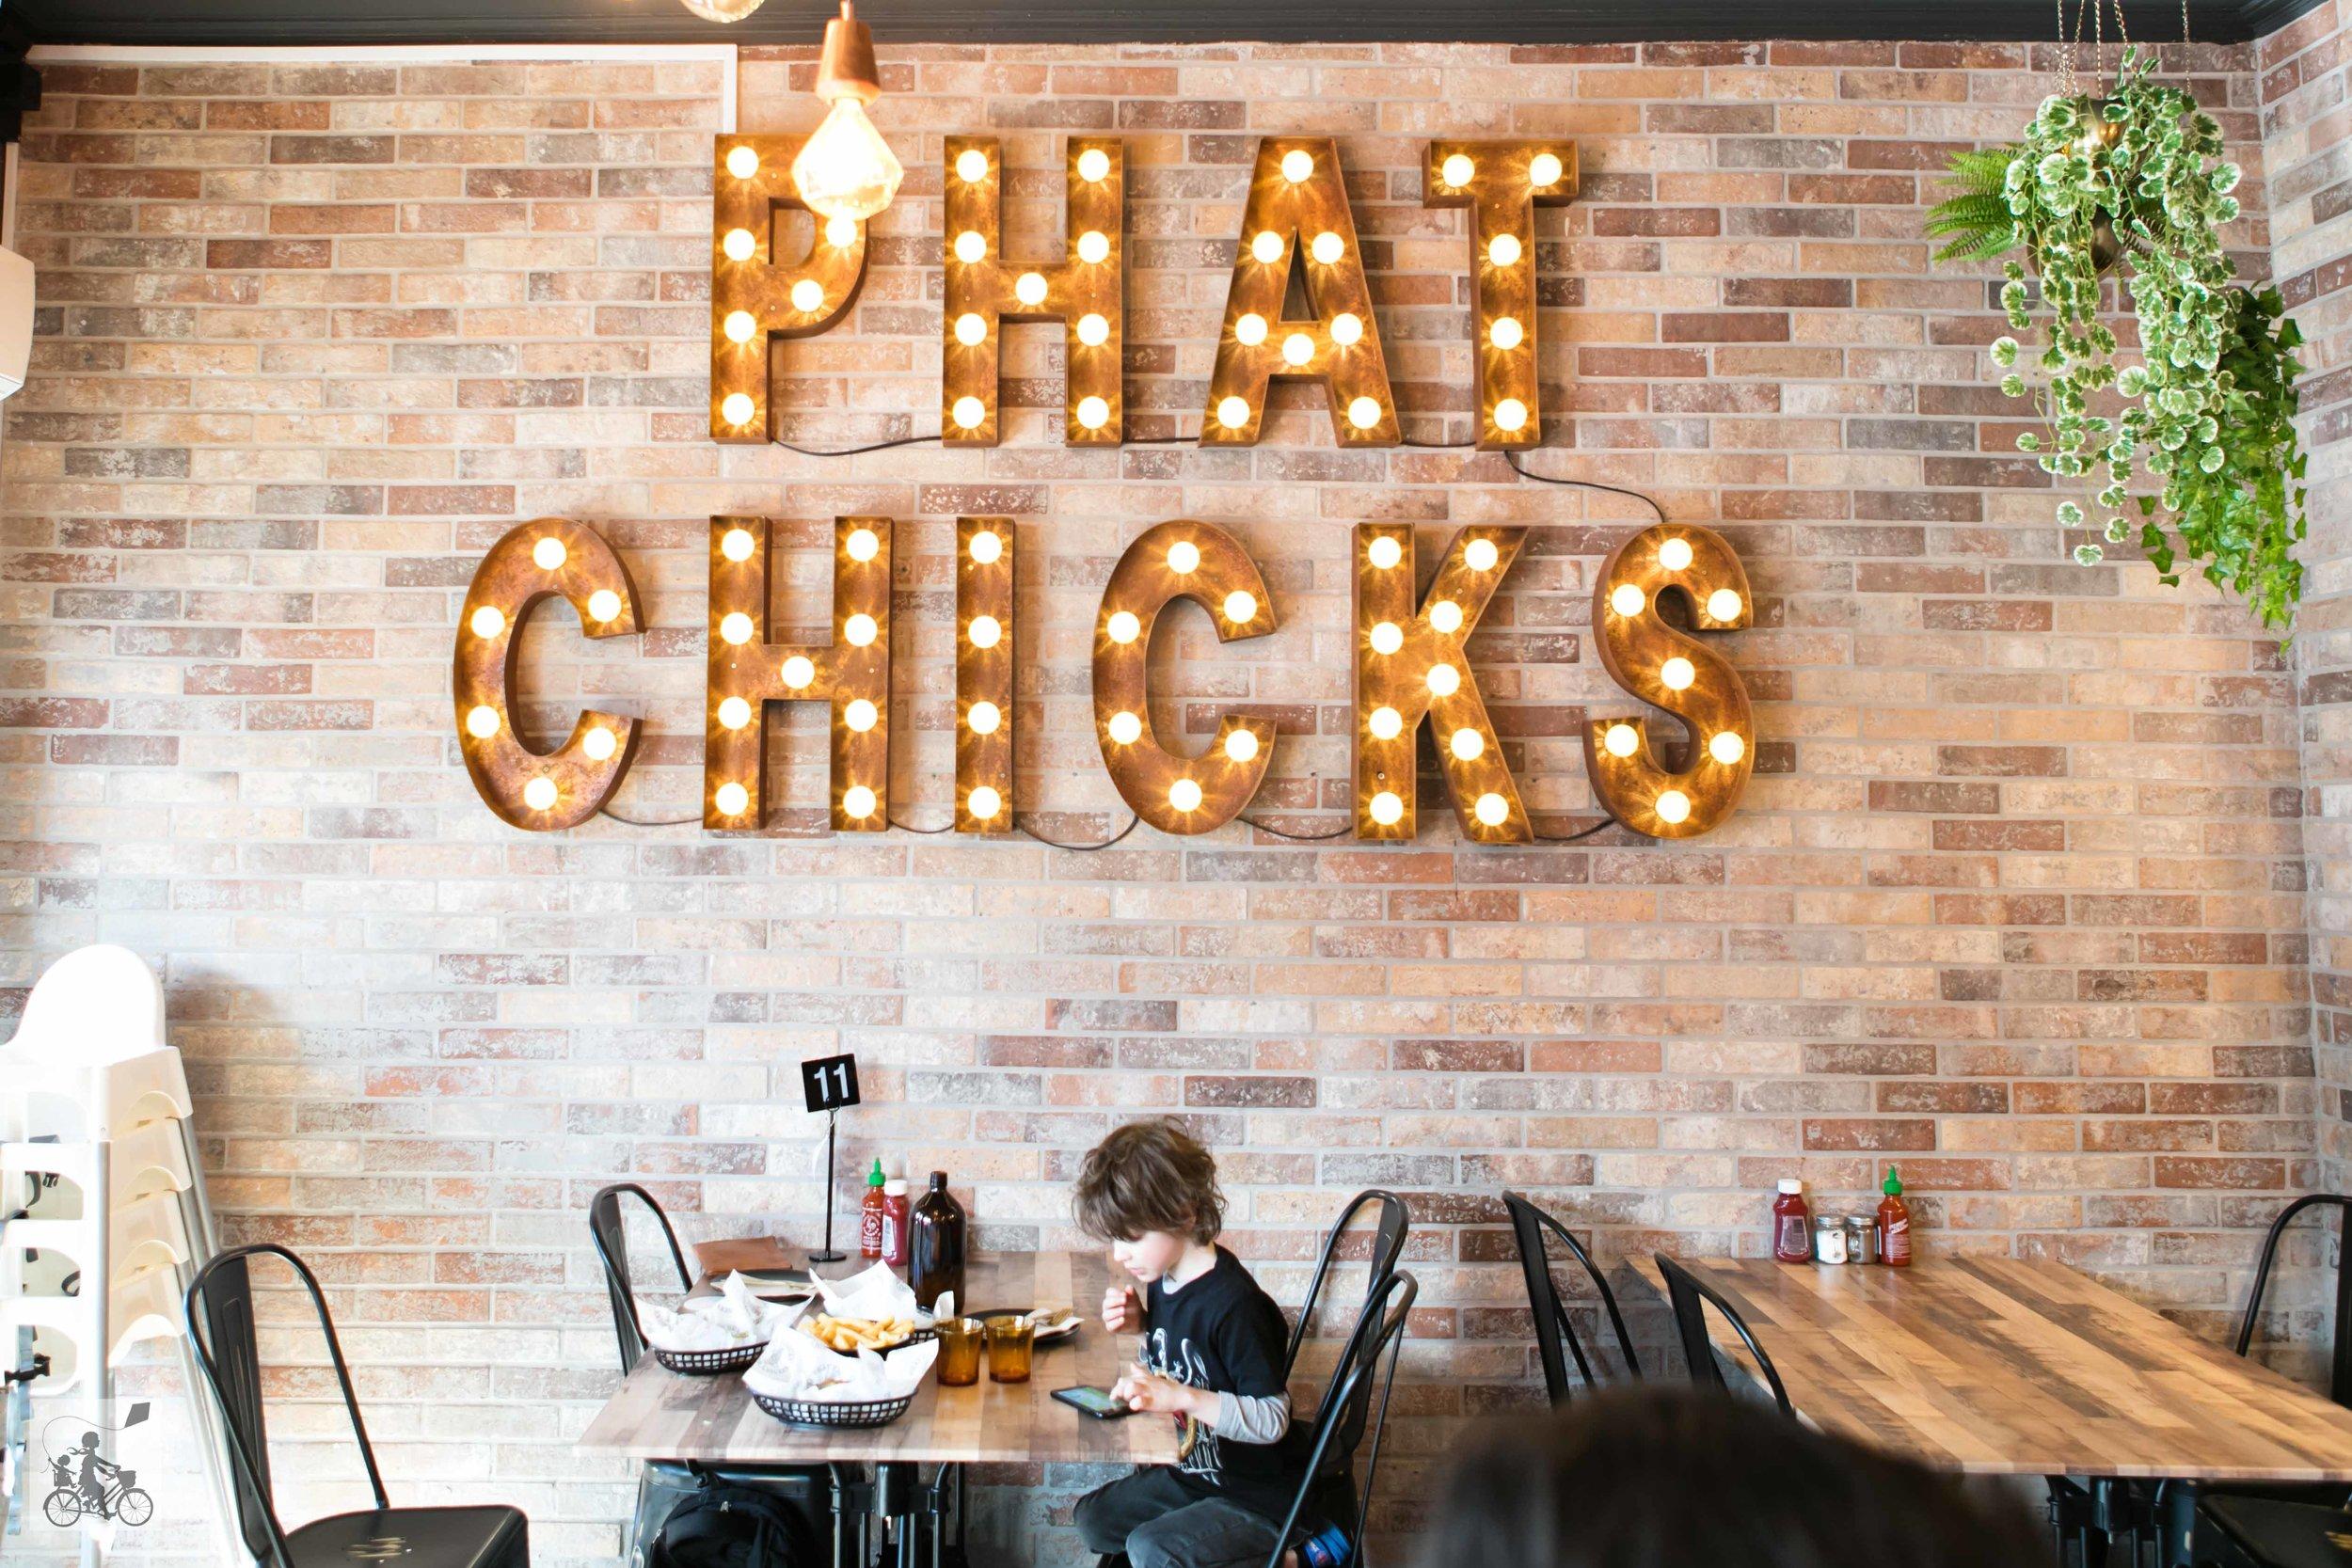 phat chicks - mamma knows west